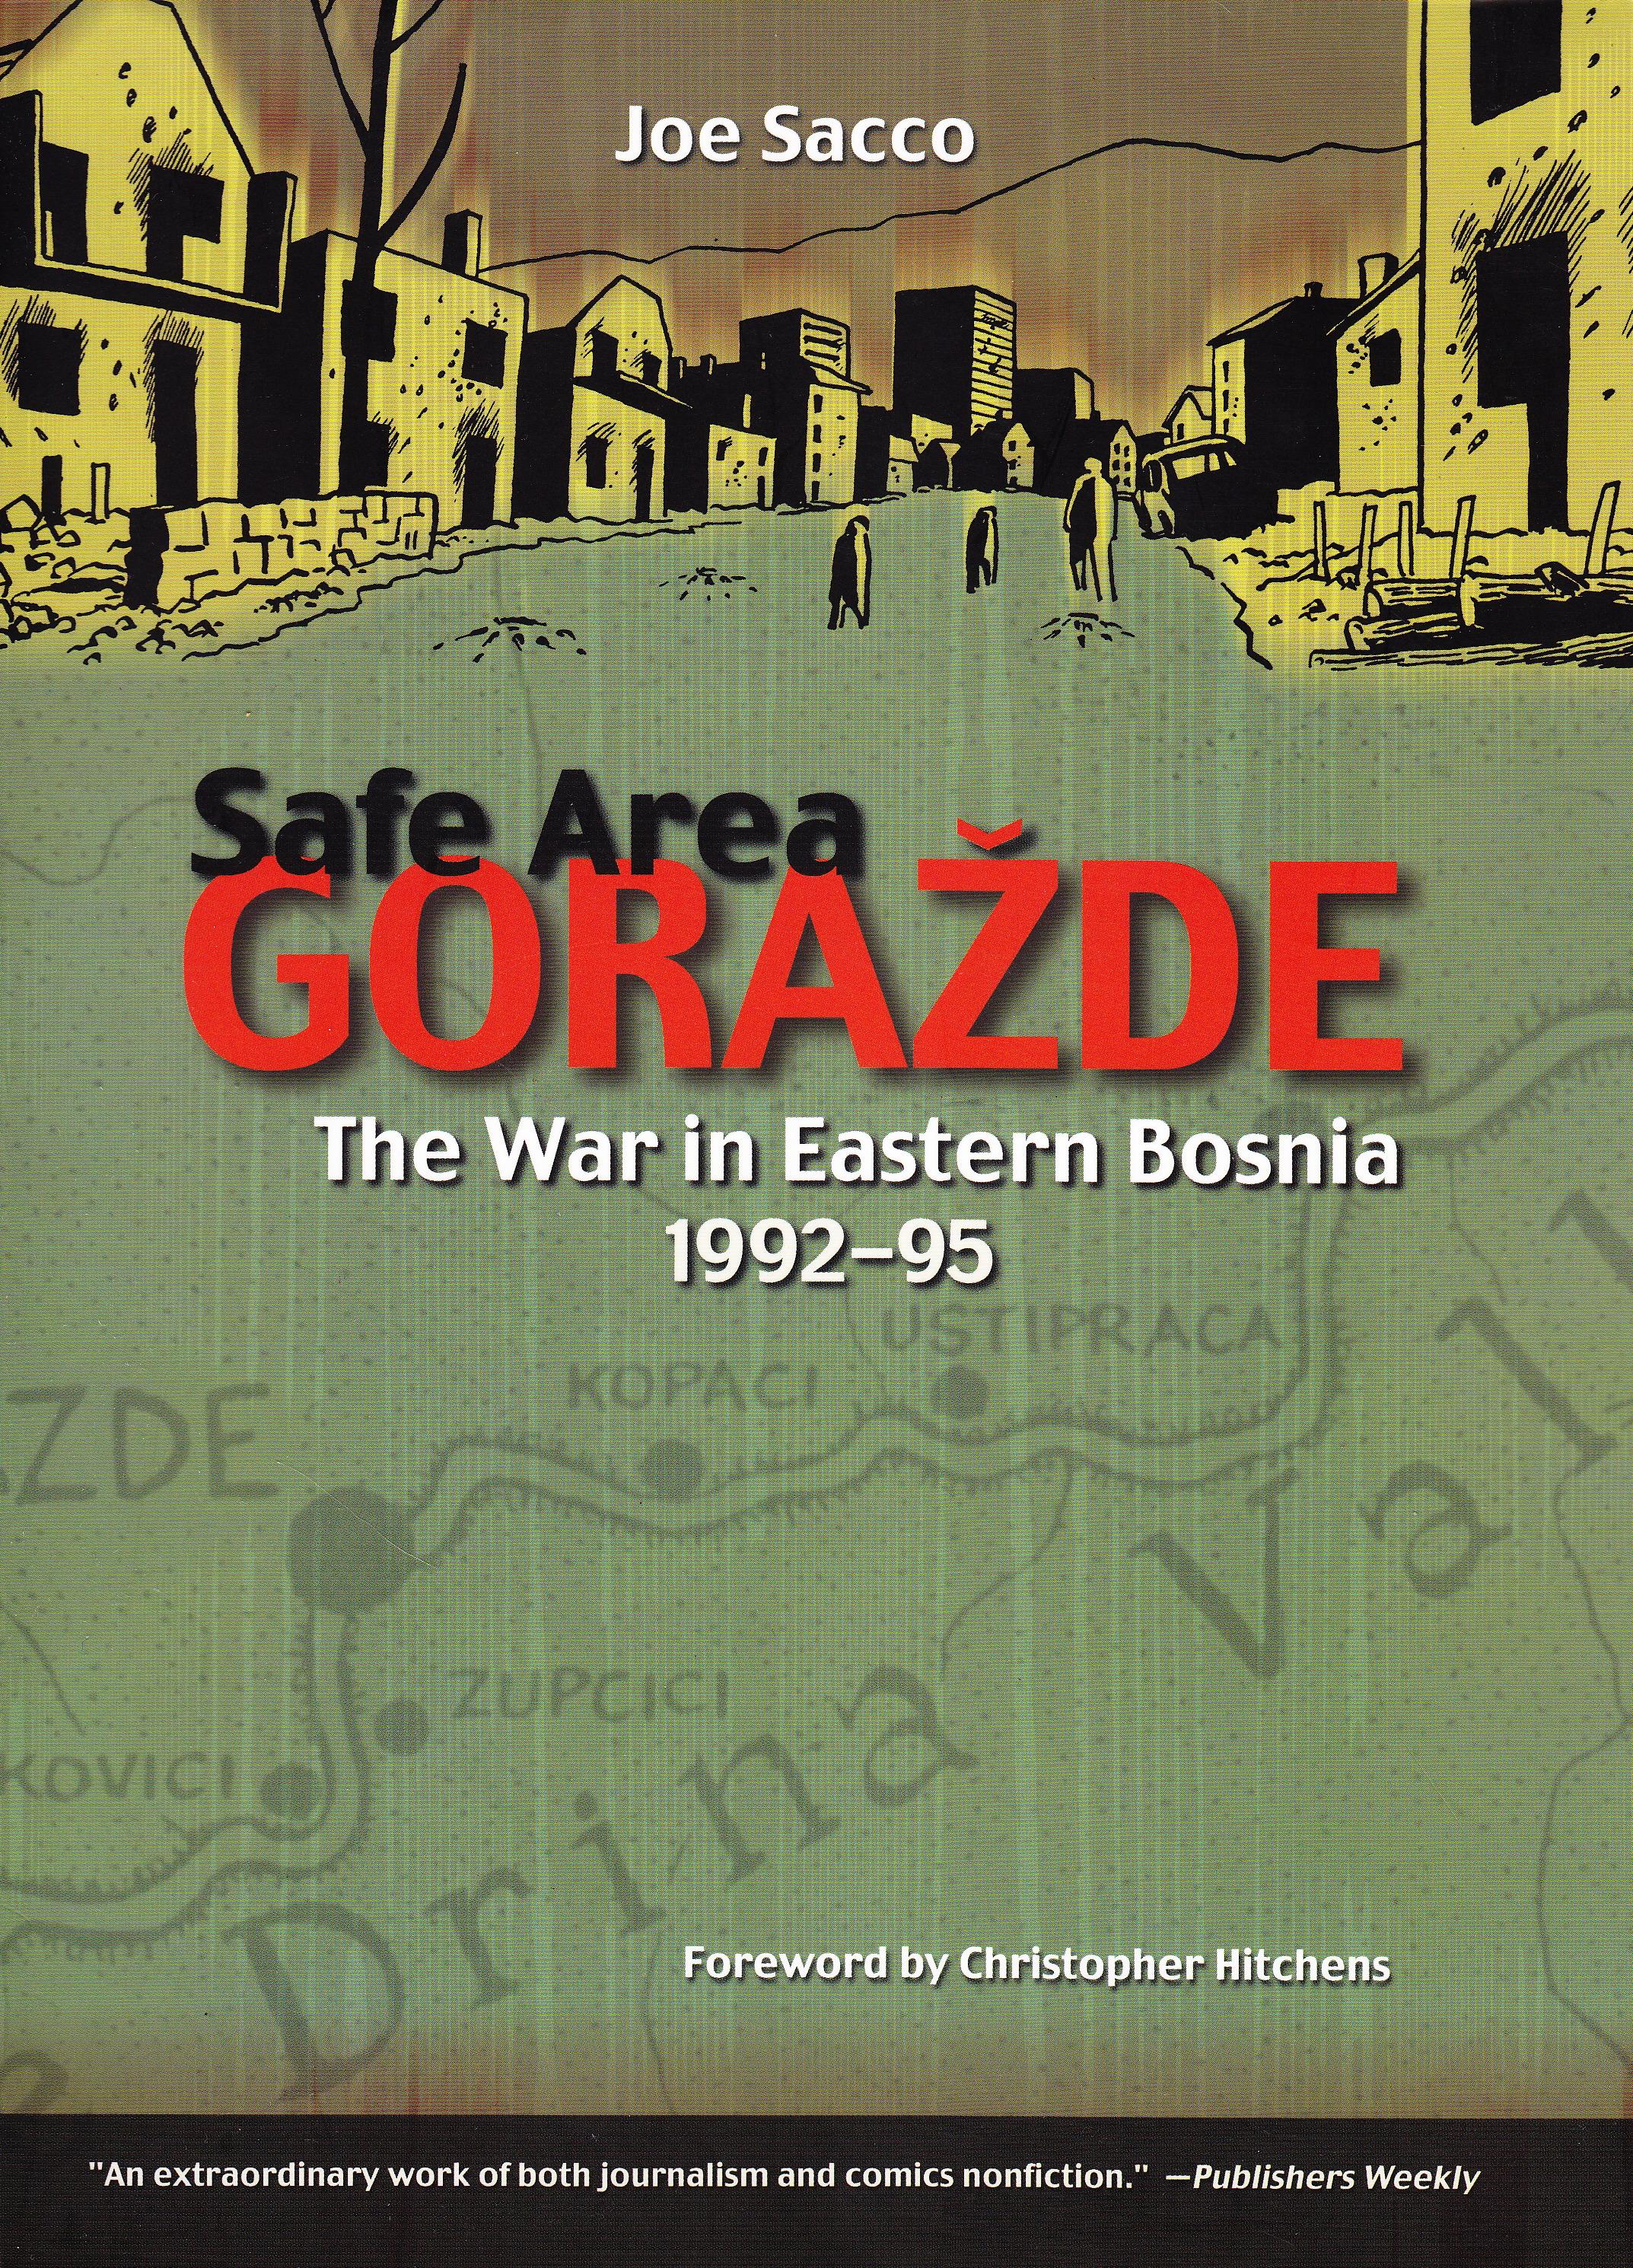 Safe Area Gorazde: The War in Eastern Bosnia 1992-1995